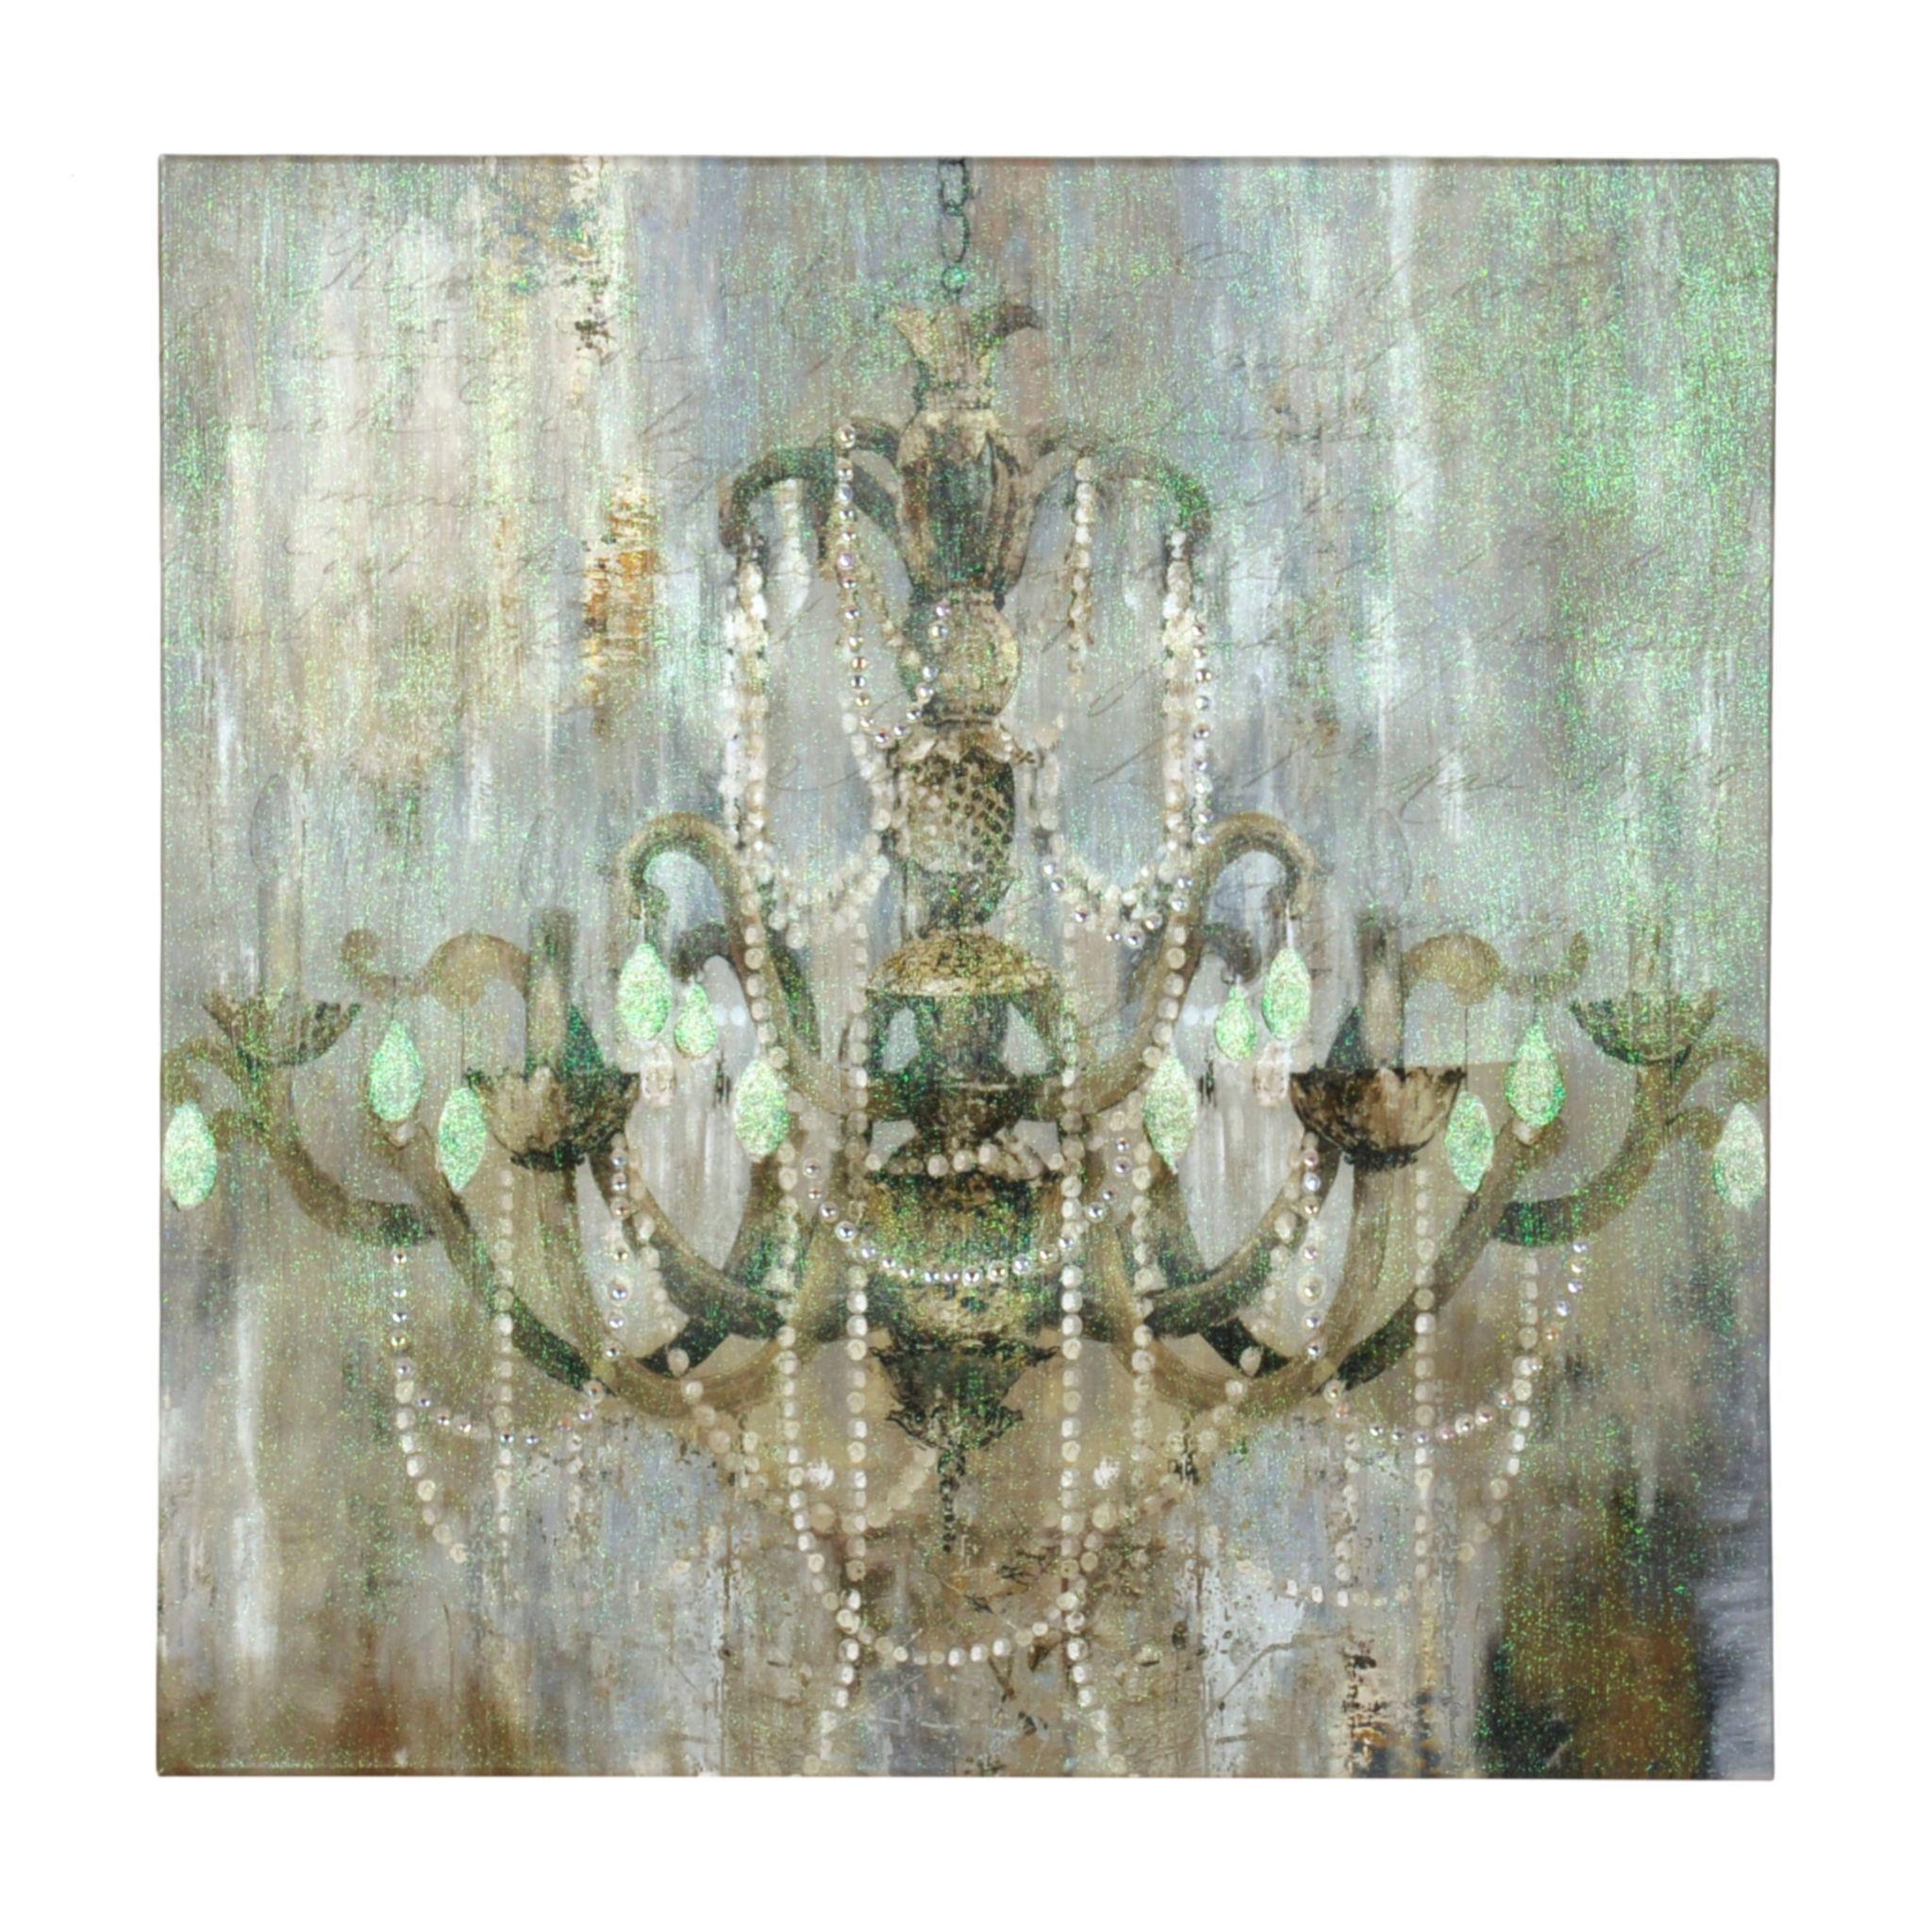 pin chandelier bainbridge pinnacle print graphic prints on art nielsen canvas painting